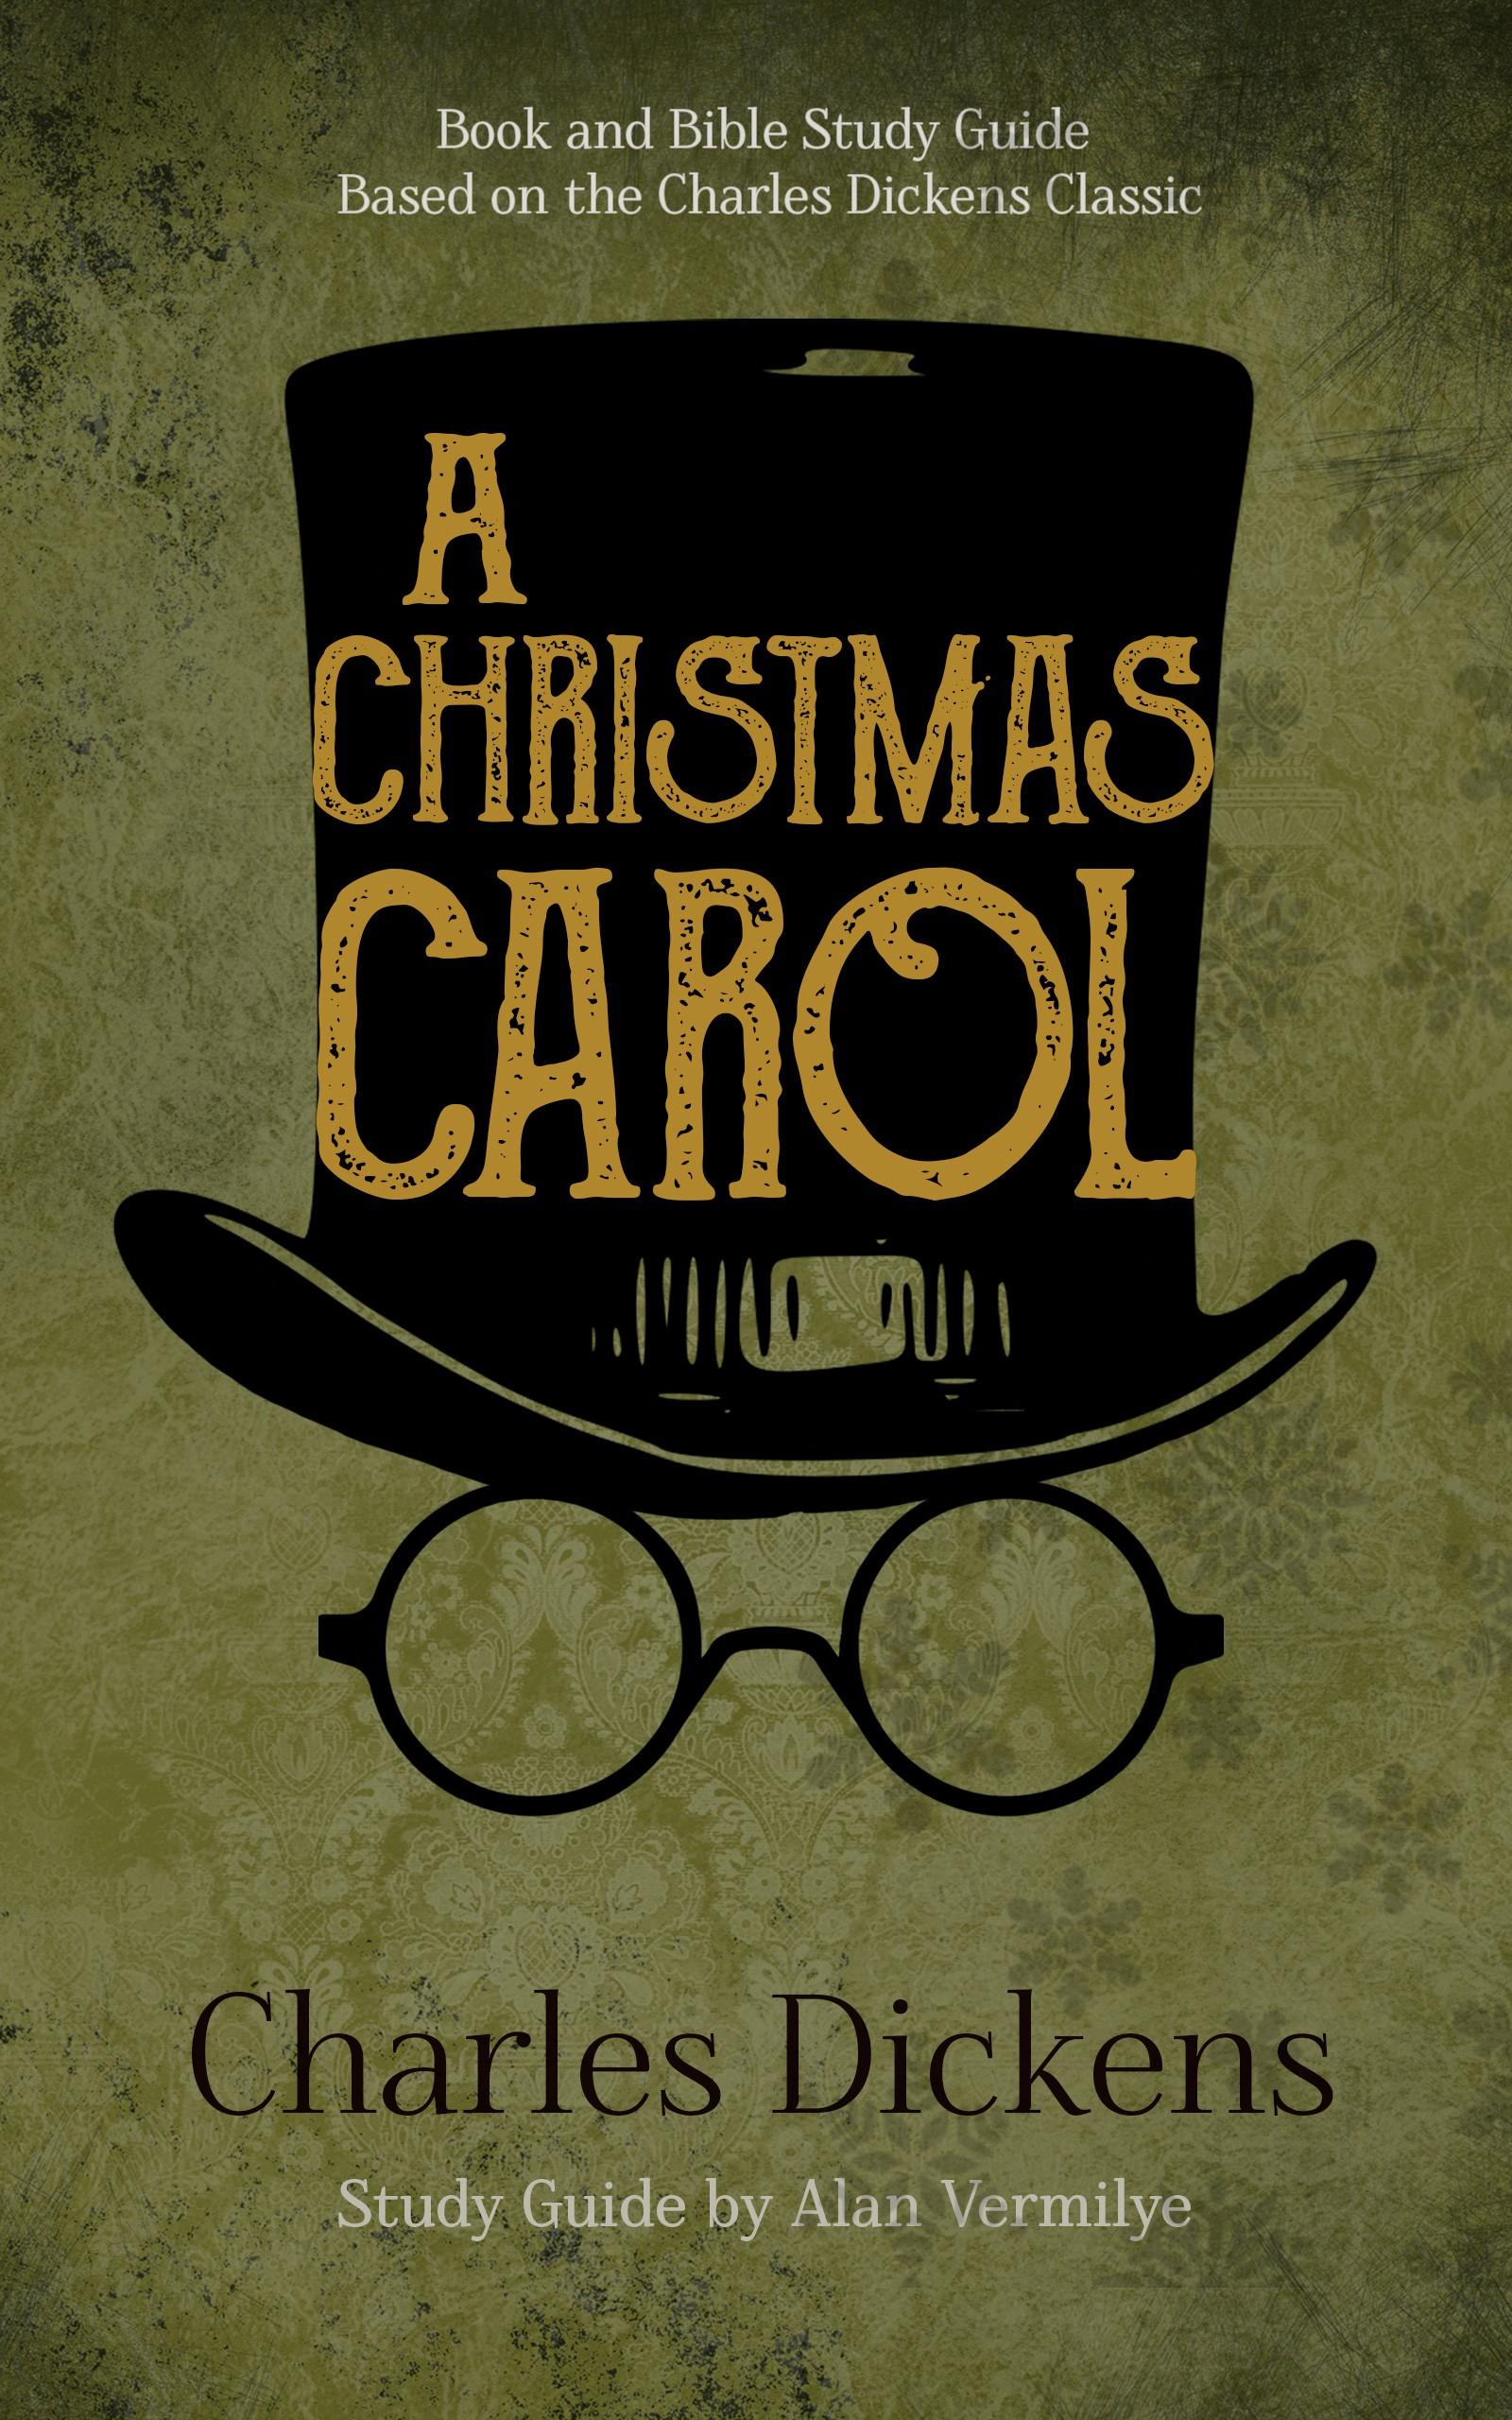 Design a book cover for A Christmas Carol with Ebenezer Scrooge